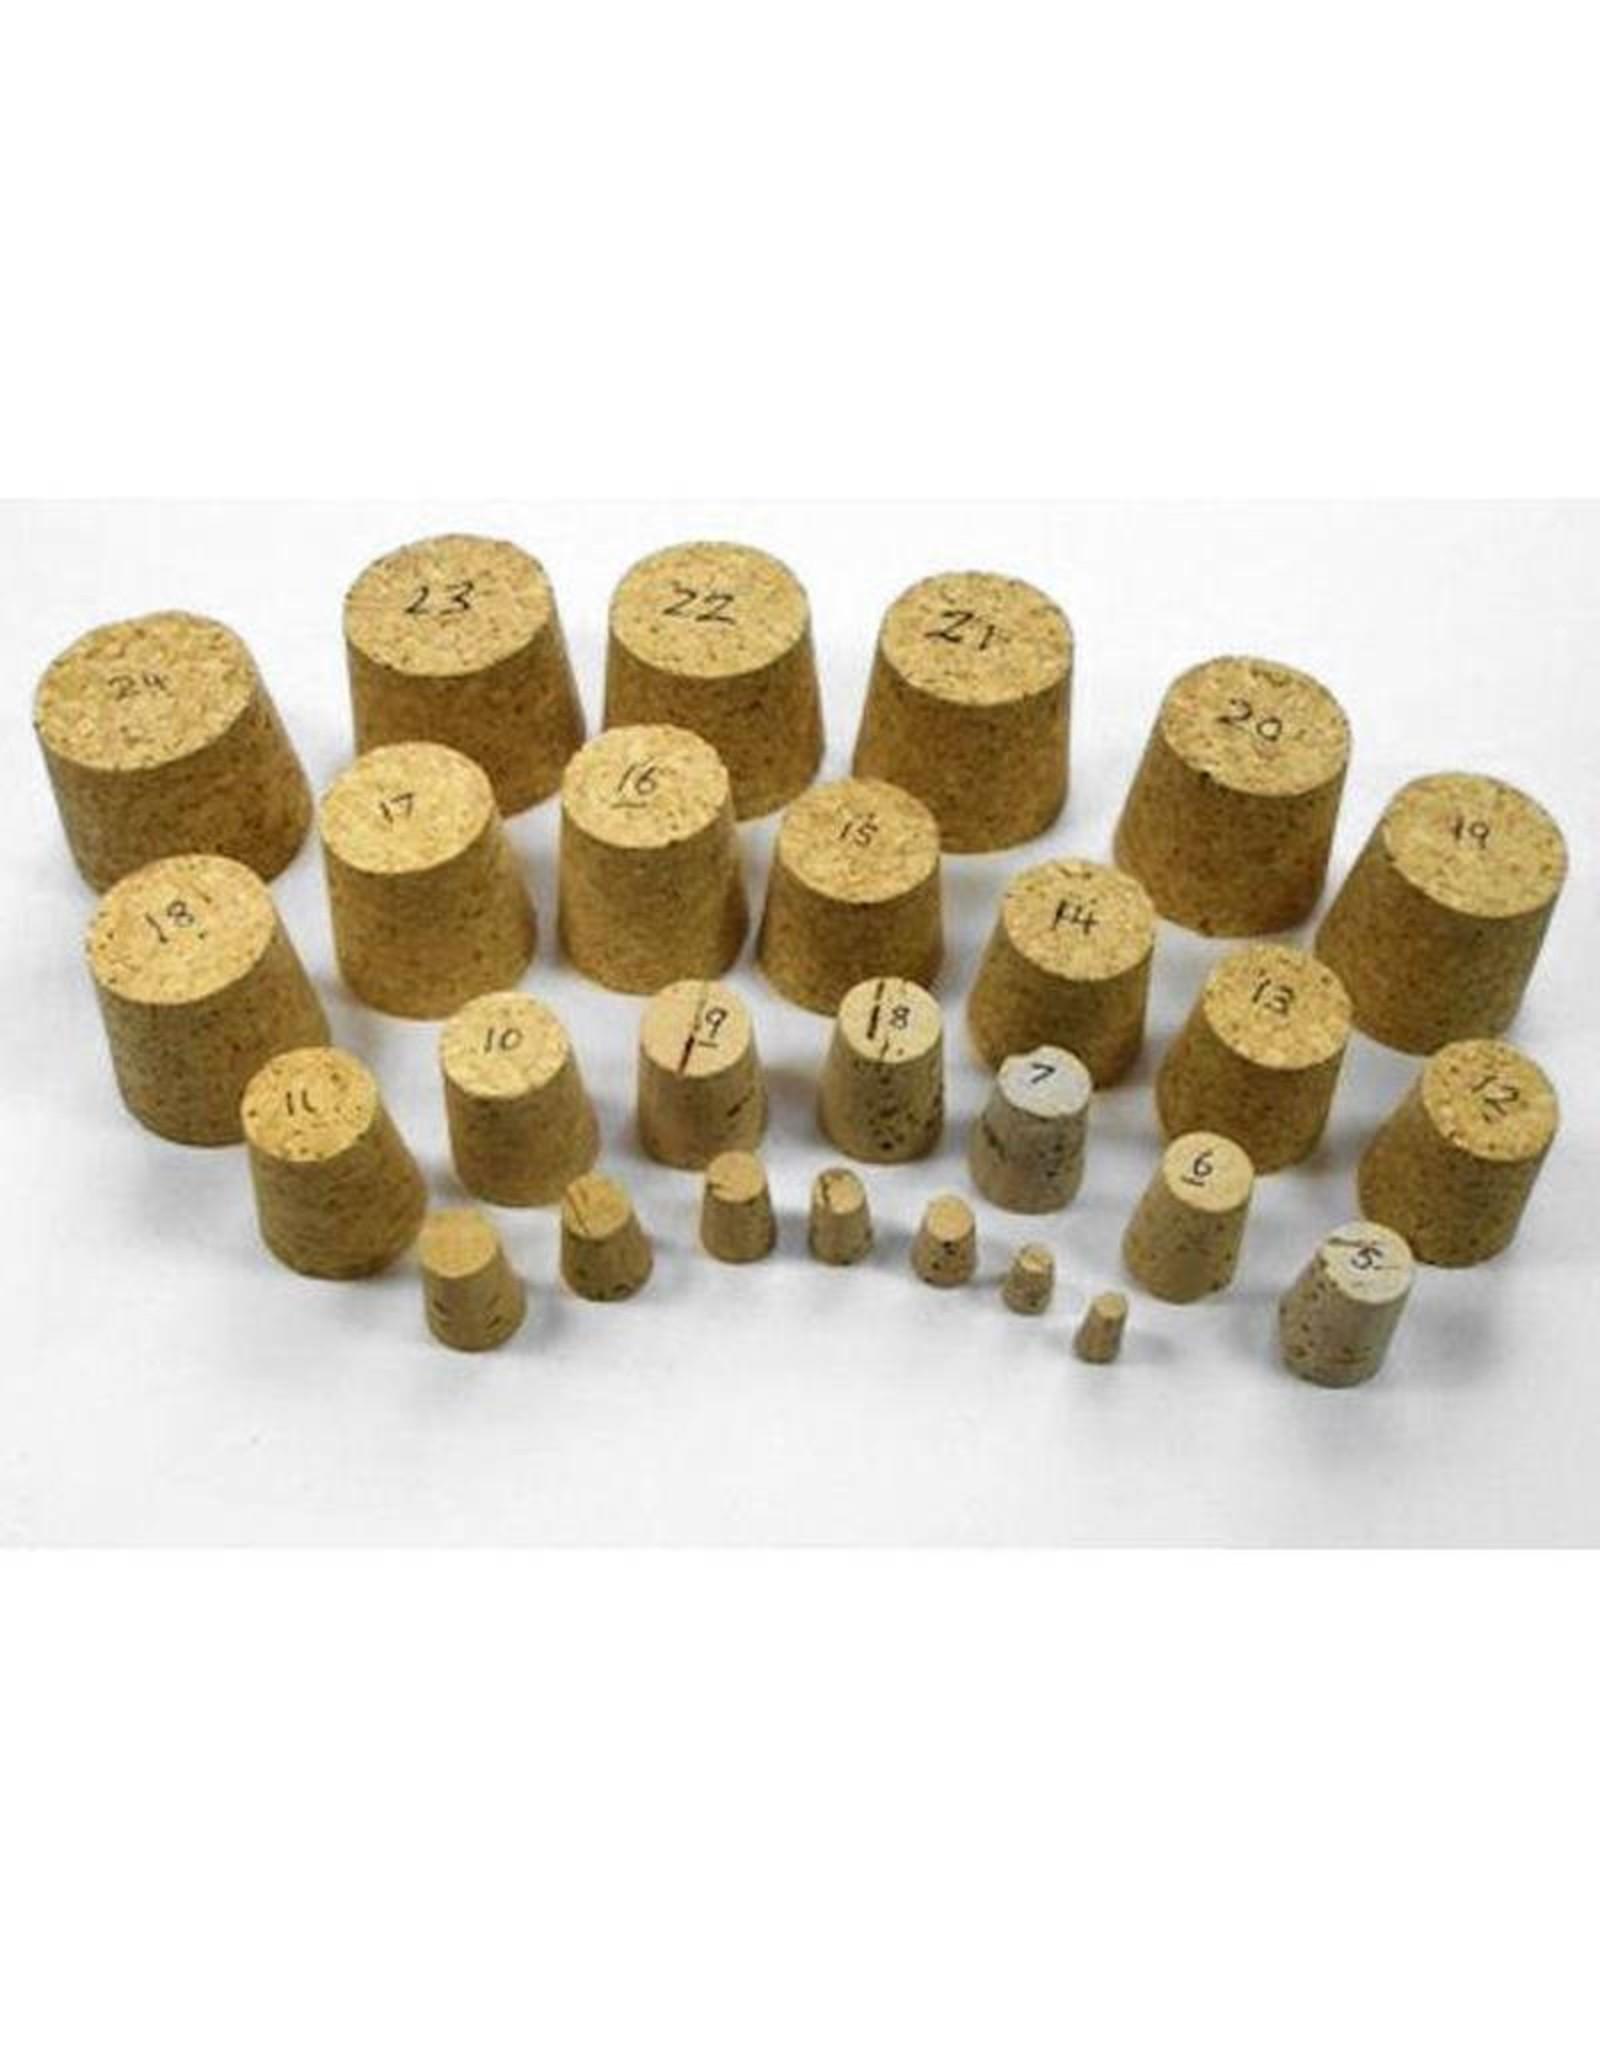 #8 Nomacorc Wine Corks 100pk